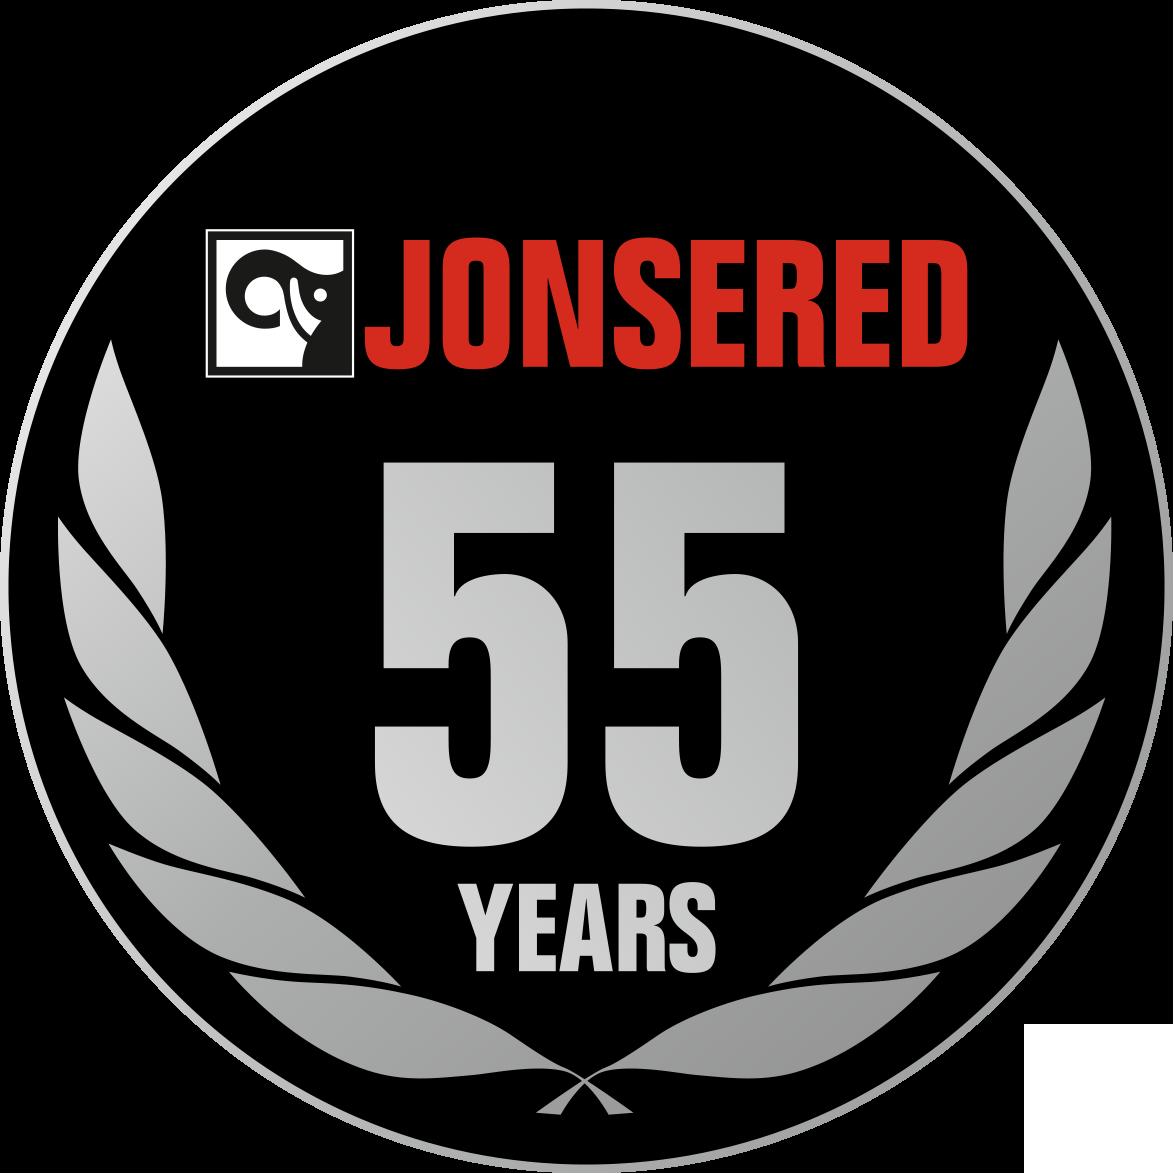 JONSERED_55YEARS_symbol_RGB_OUTLINE_BIG